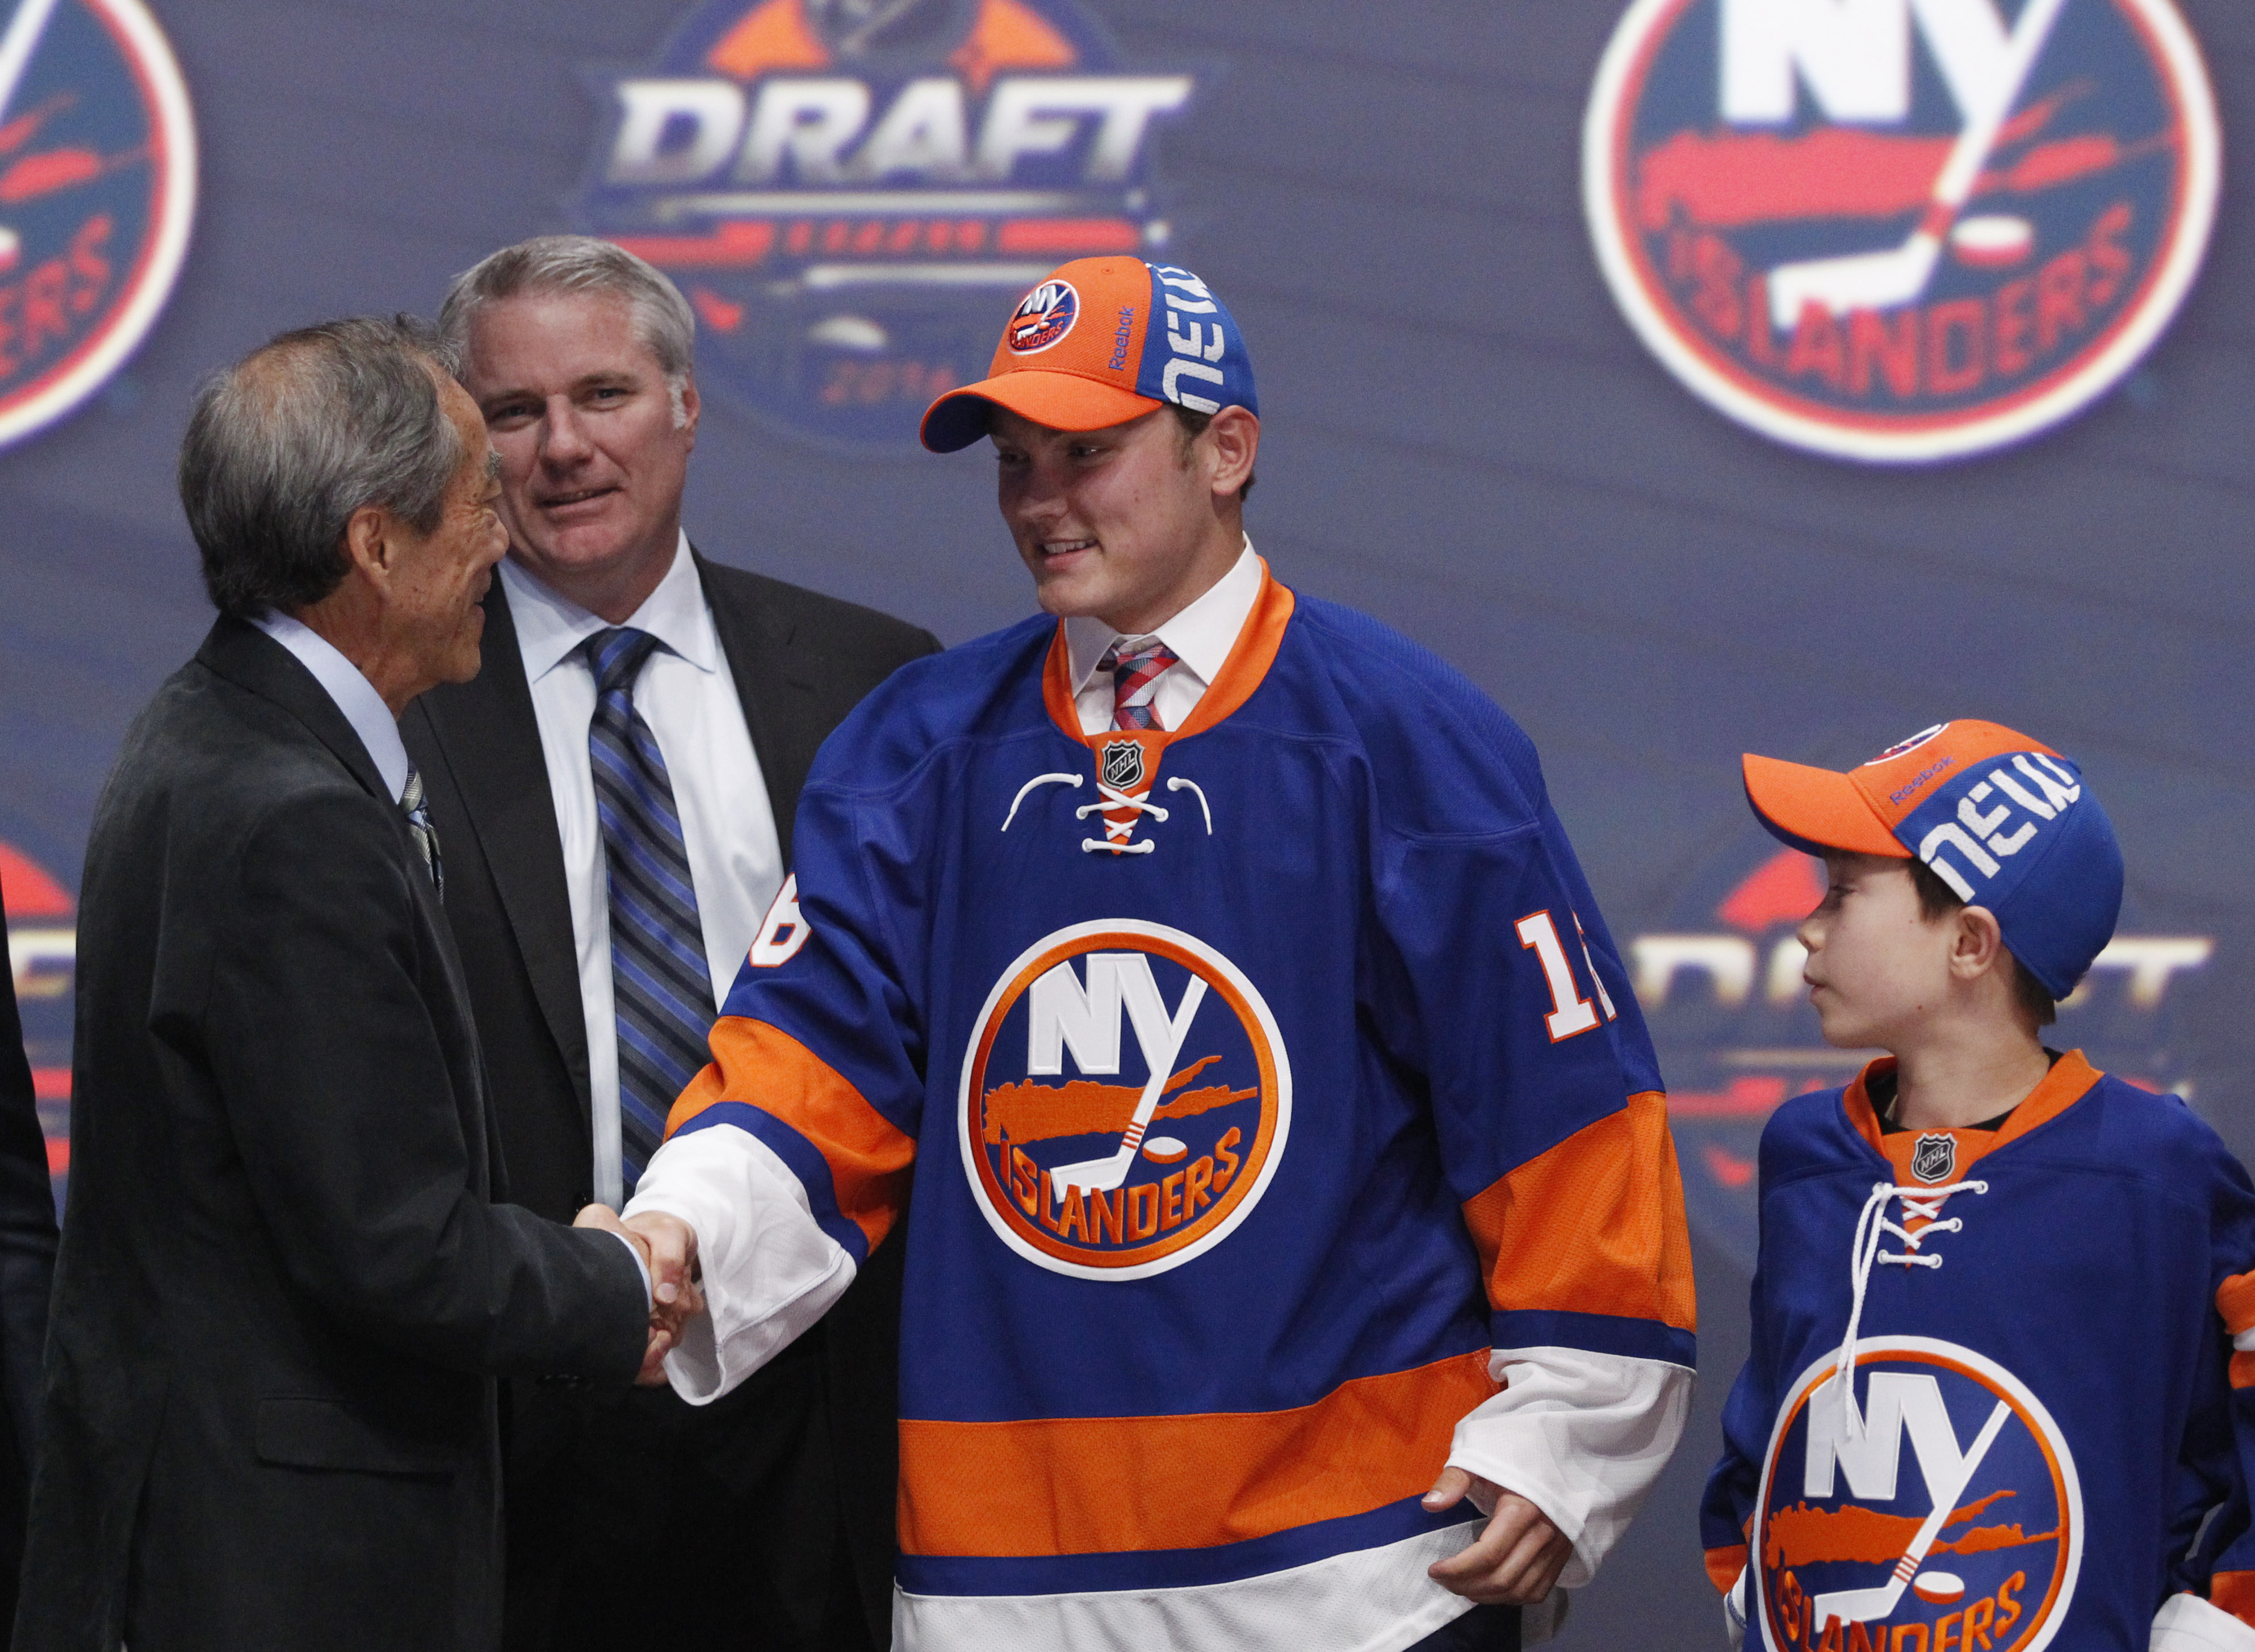 New York Islanders Bellows